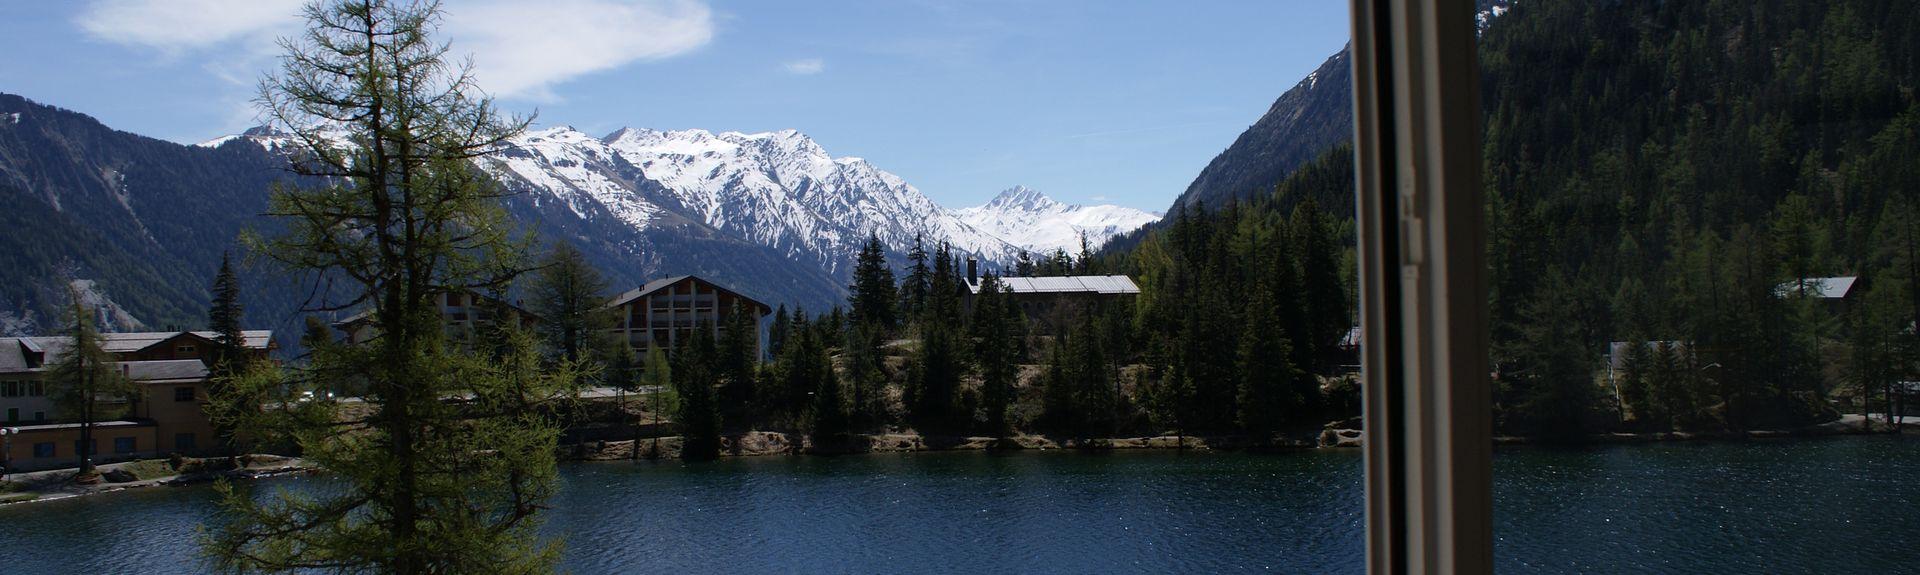 La Fouly, Orsieres, Valais, Schweiz